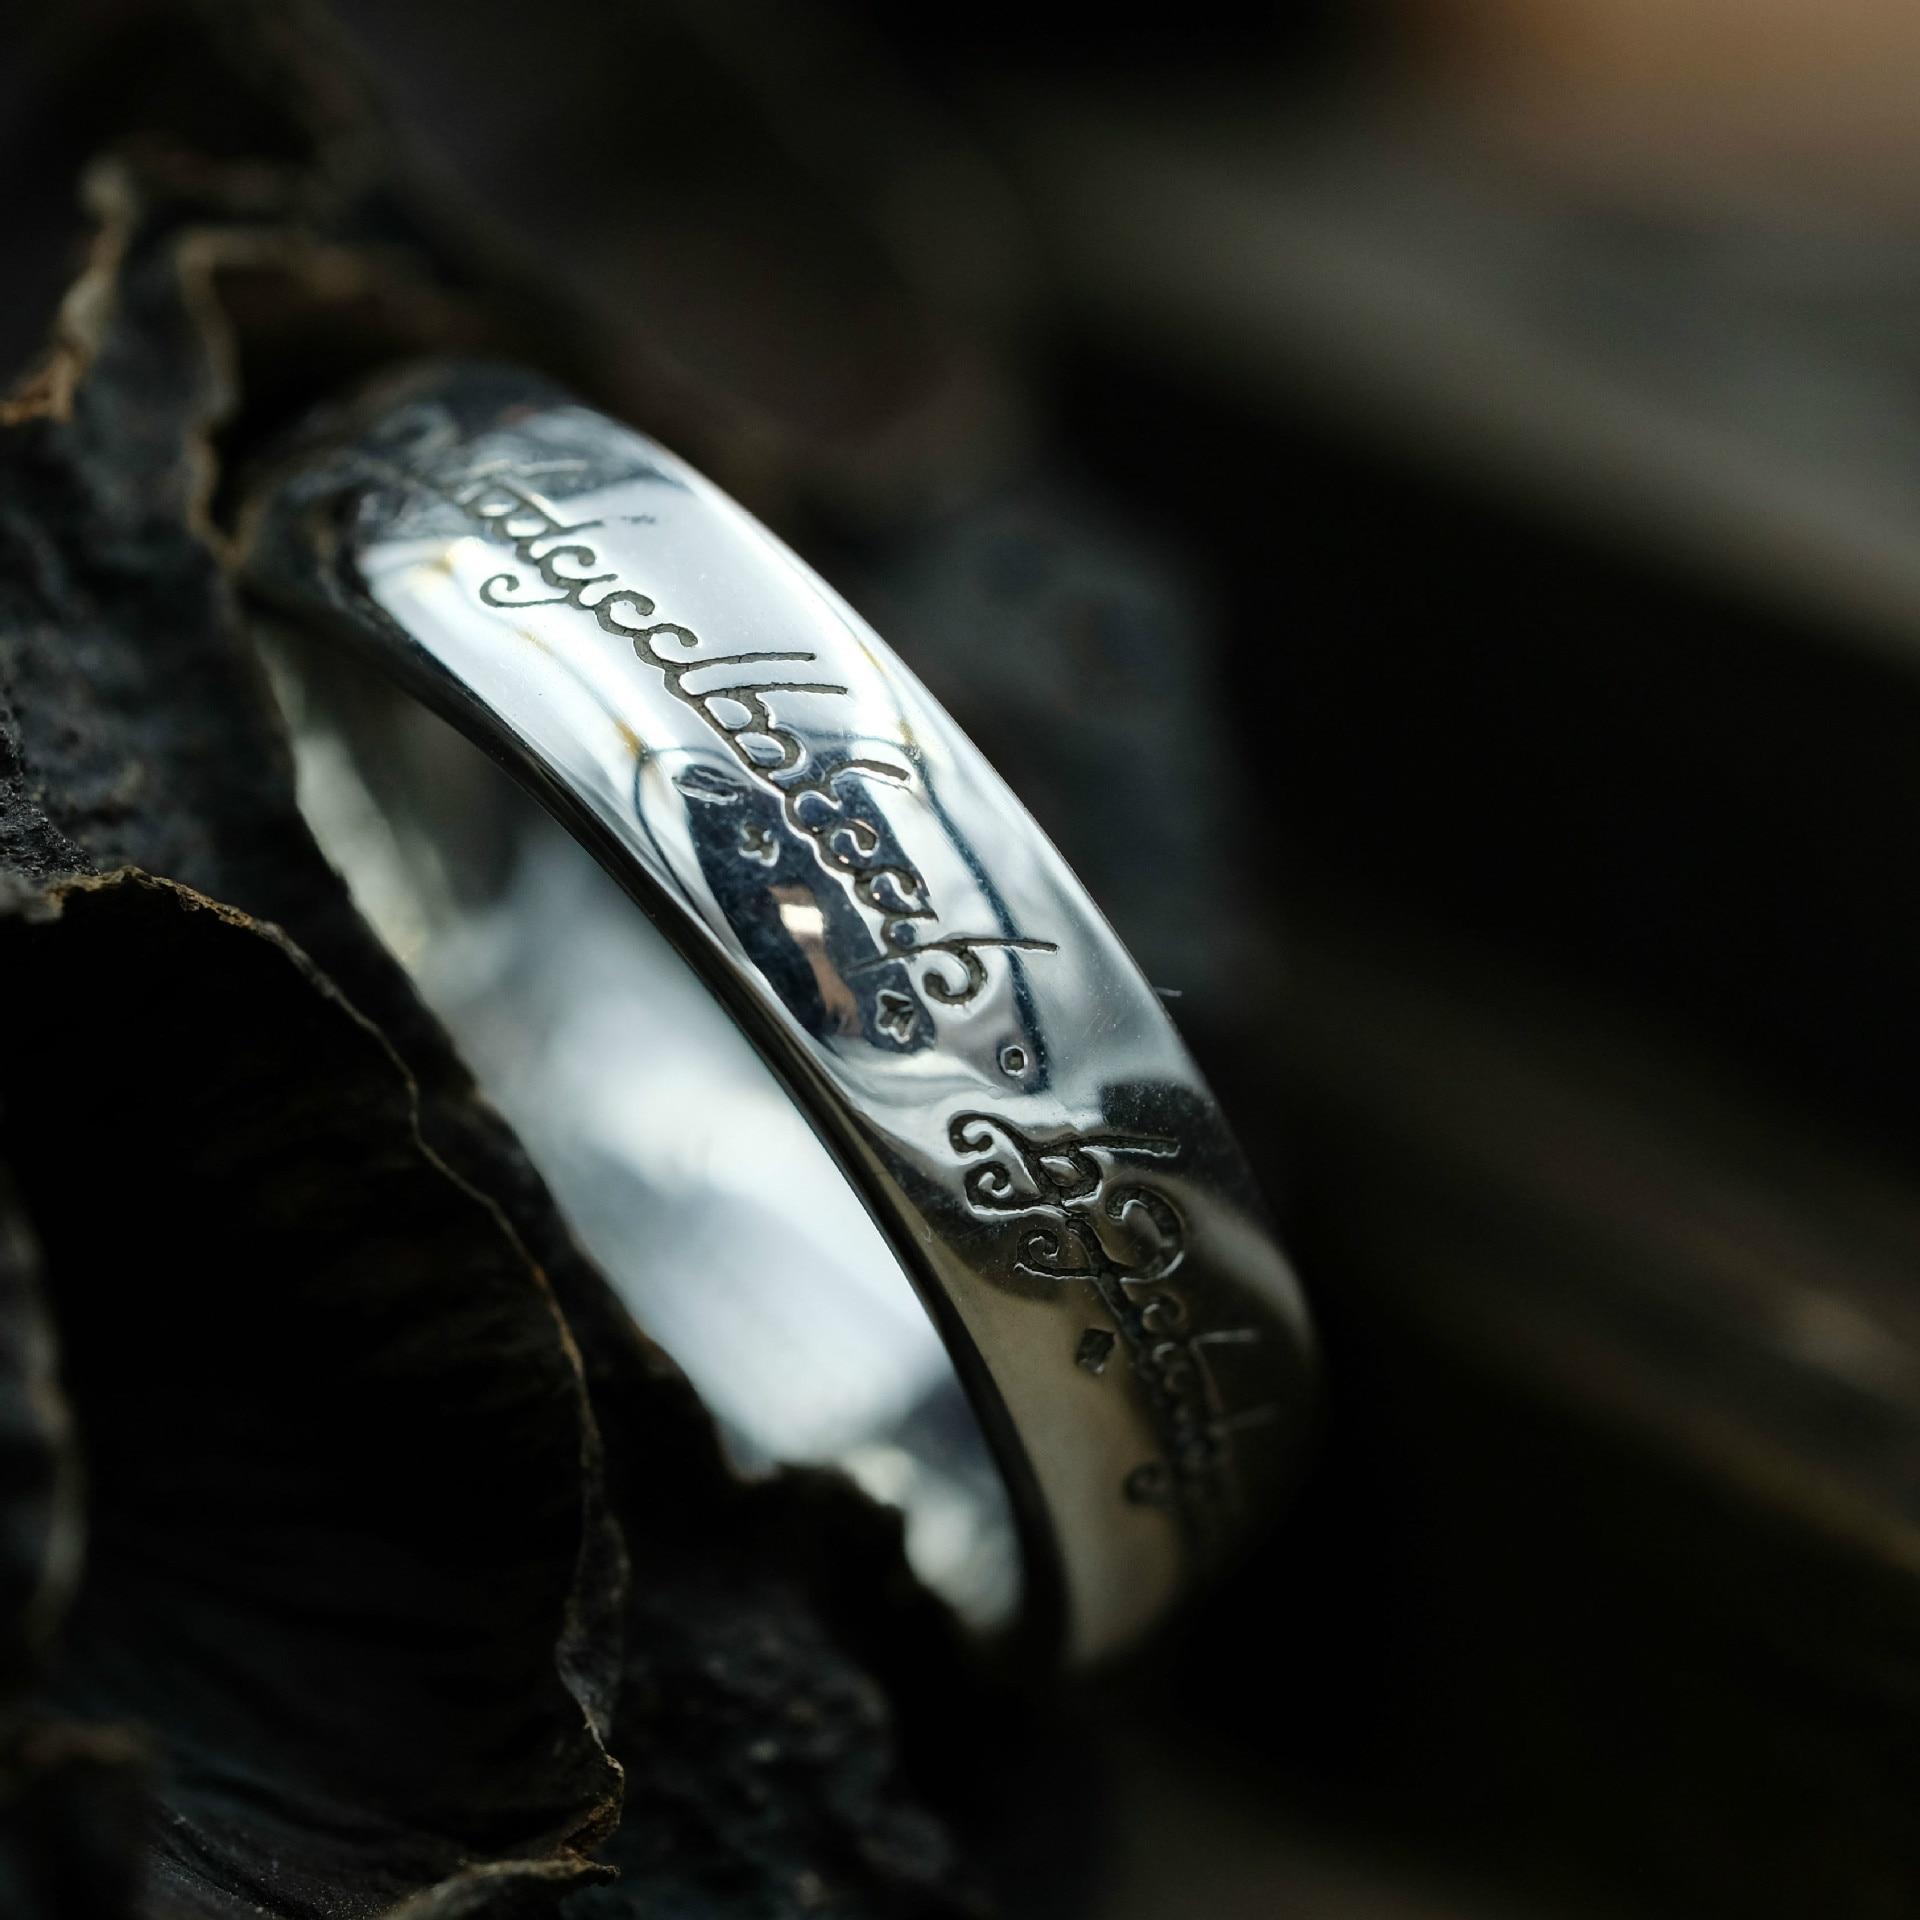 Letter Magic Rings Tibetan Silver Lovers Rings S925 Antiallergic Vintage Lovers Rings 925 Sterling Silver Rings for Lovers